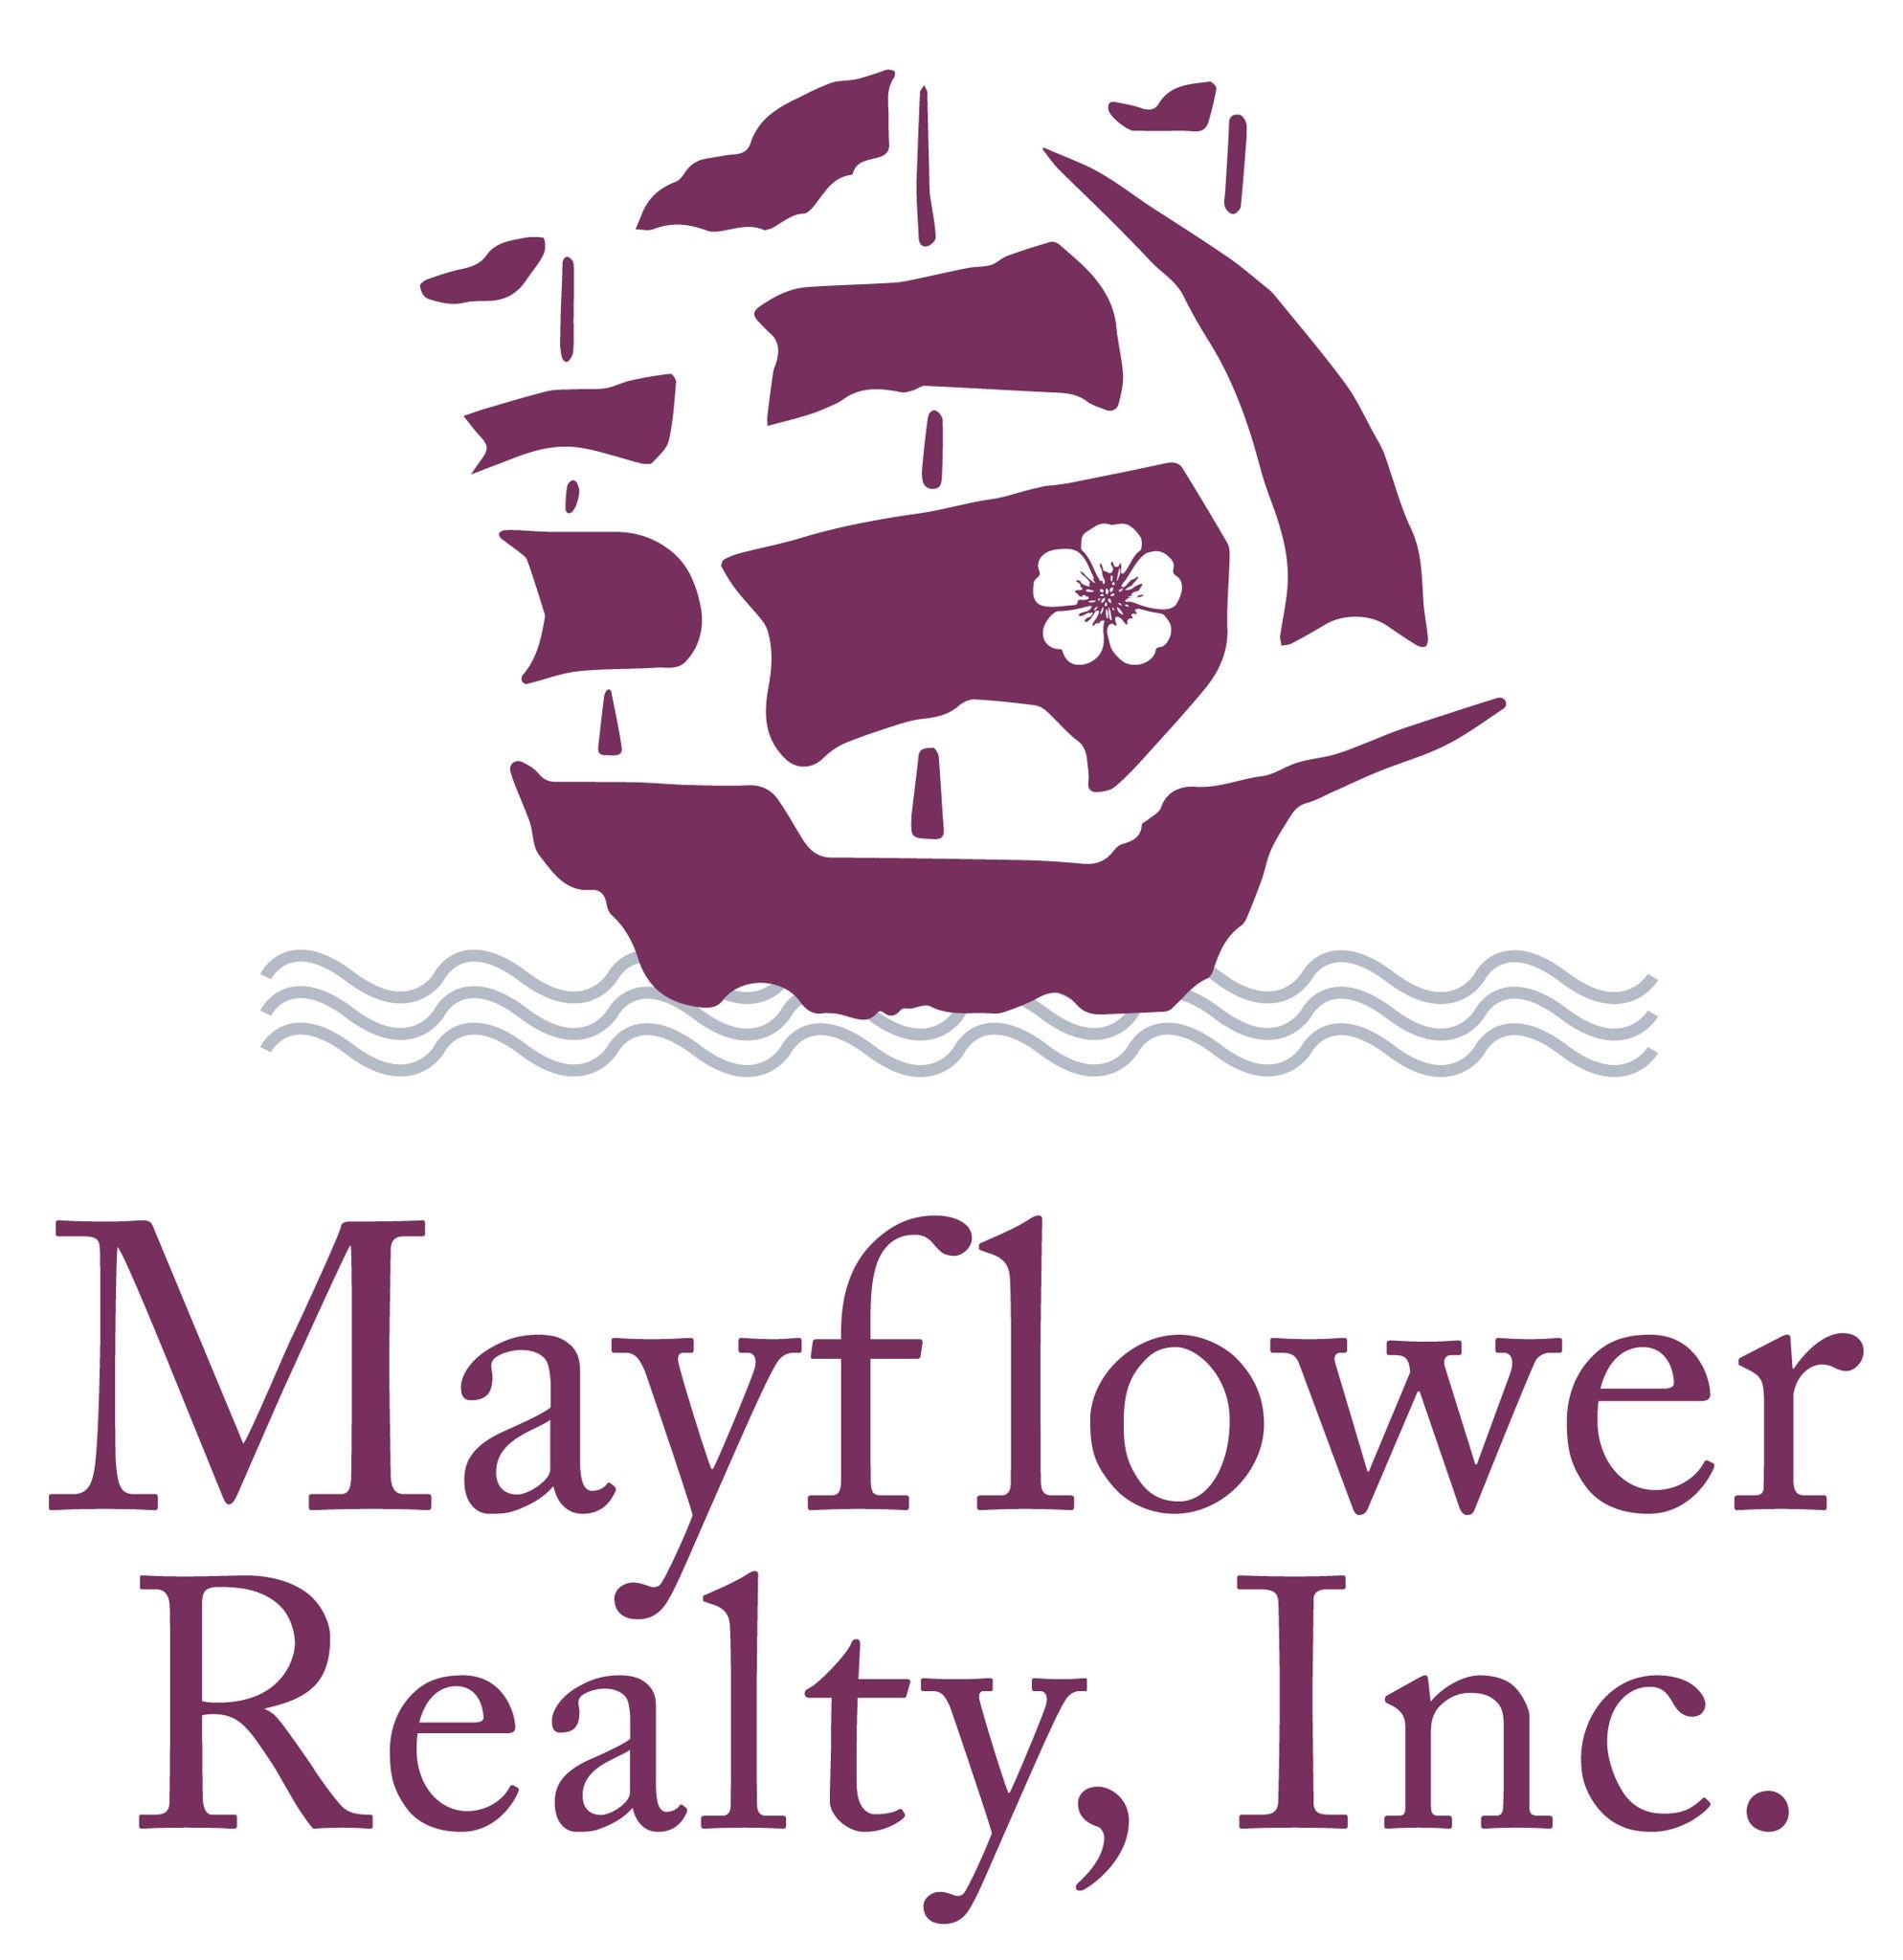 Mayflower Realty, Inc.